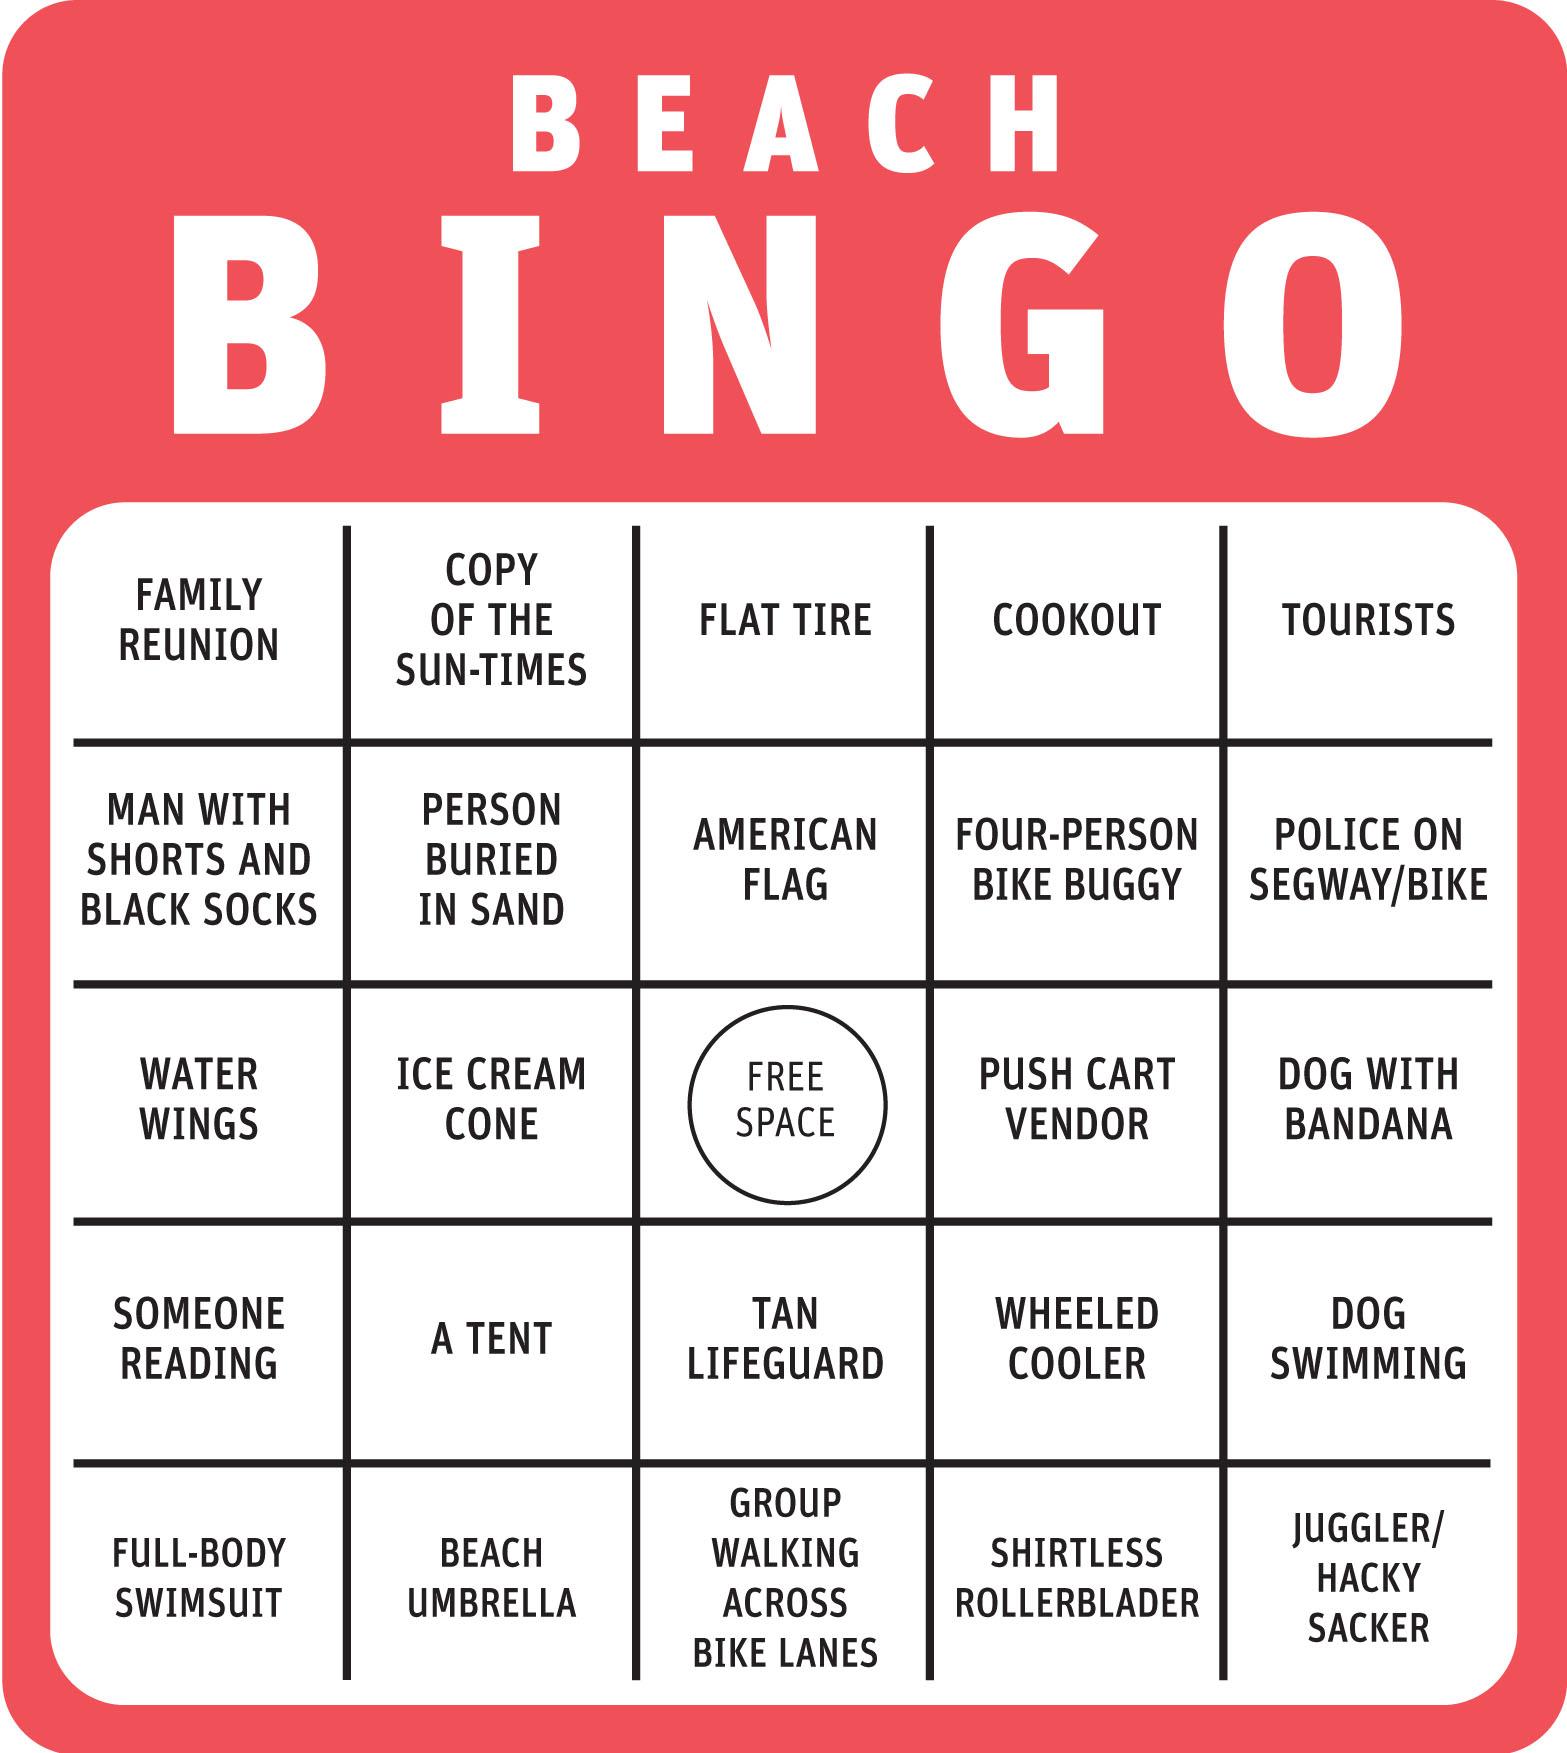 Beach Blanket Bingo Lady Goo Goo Gaga